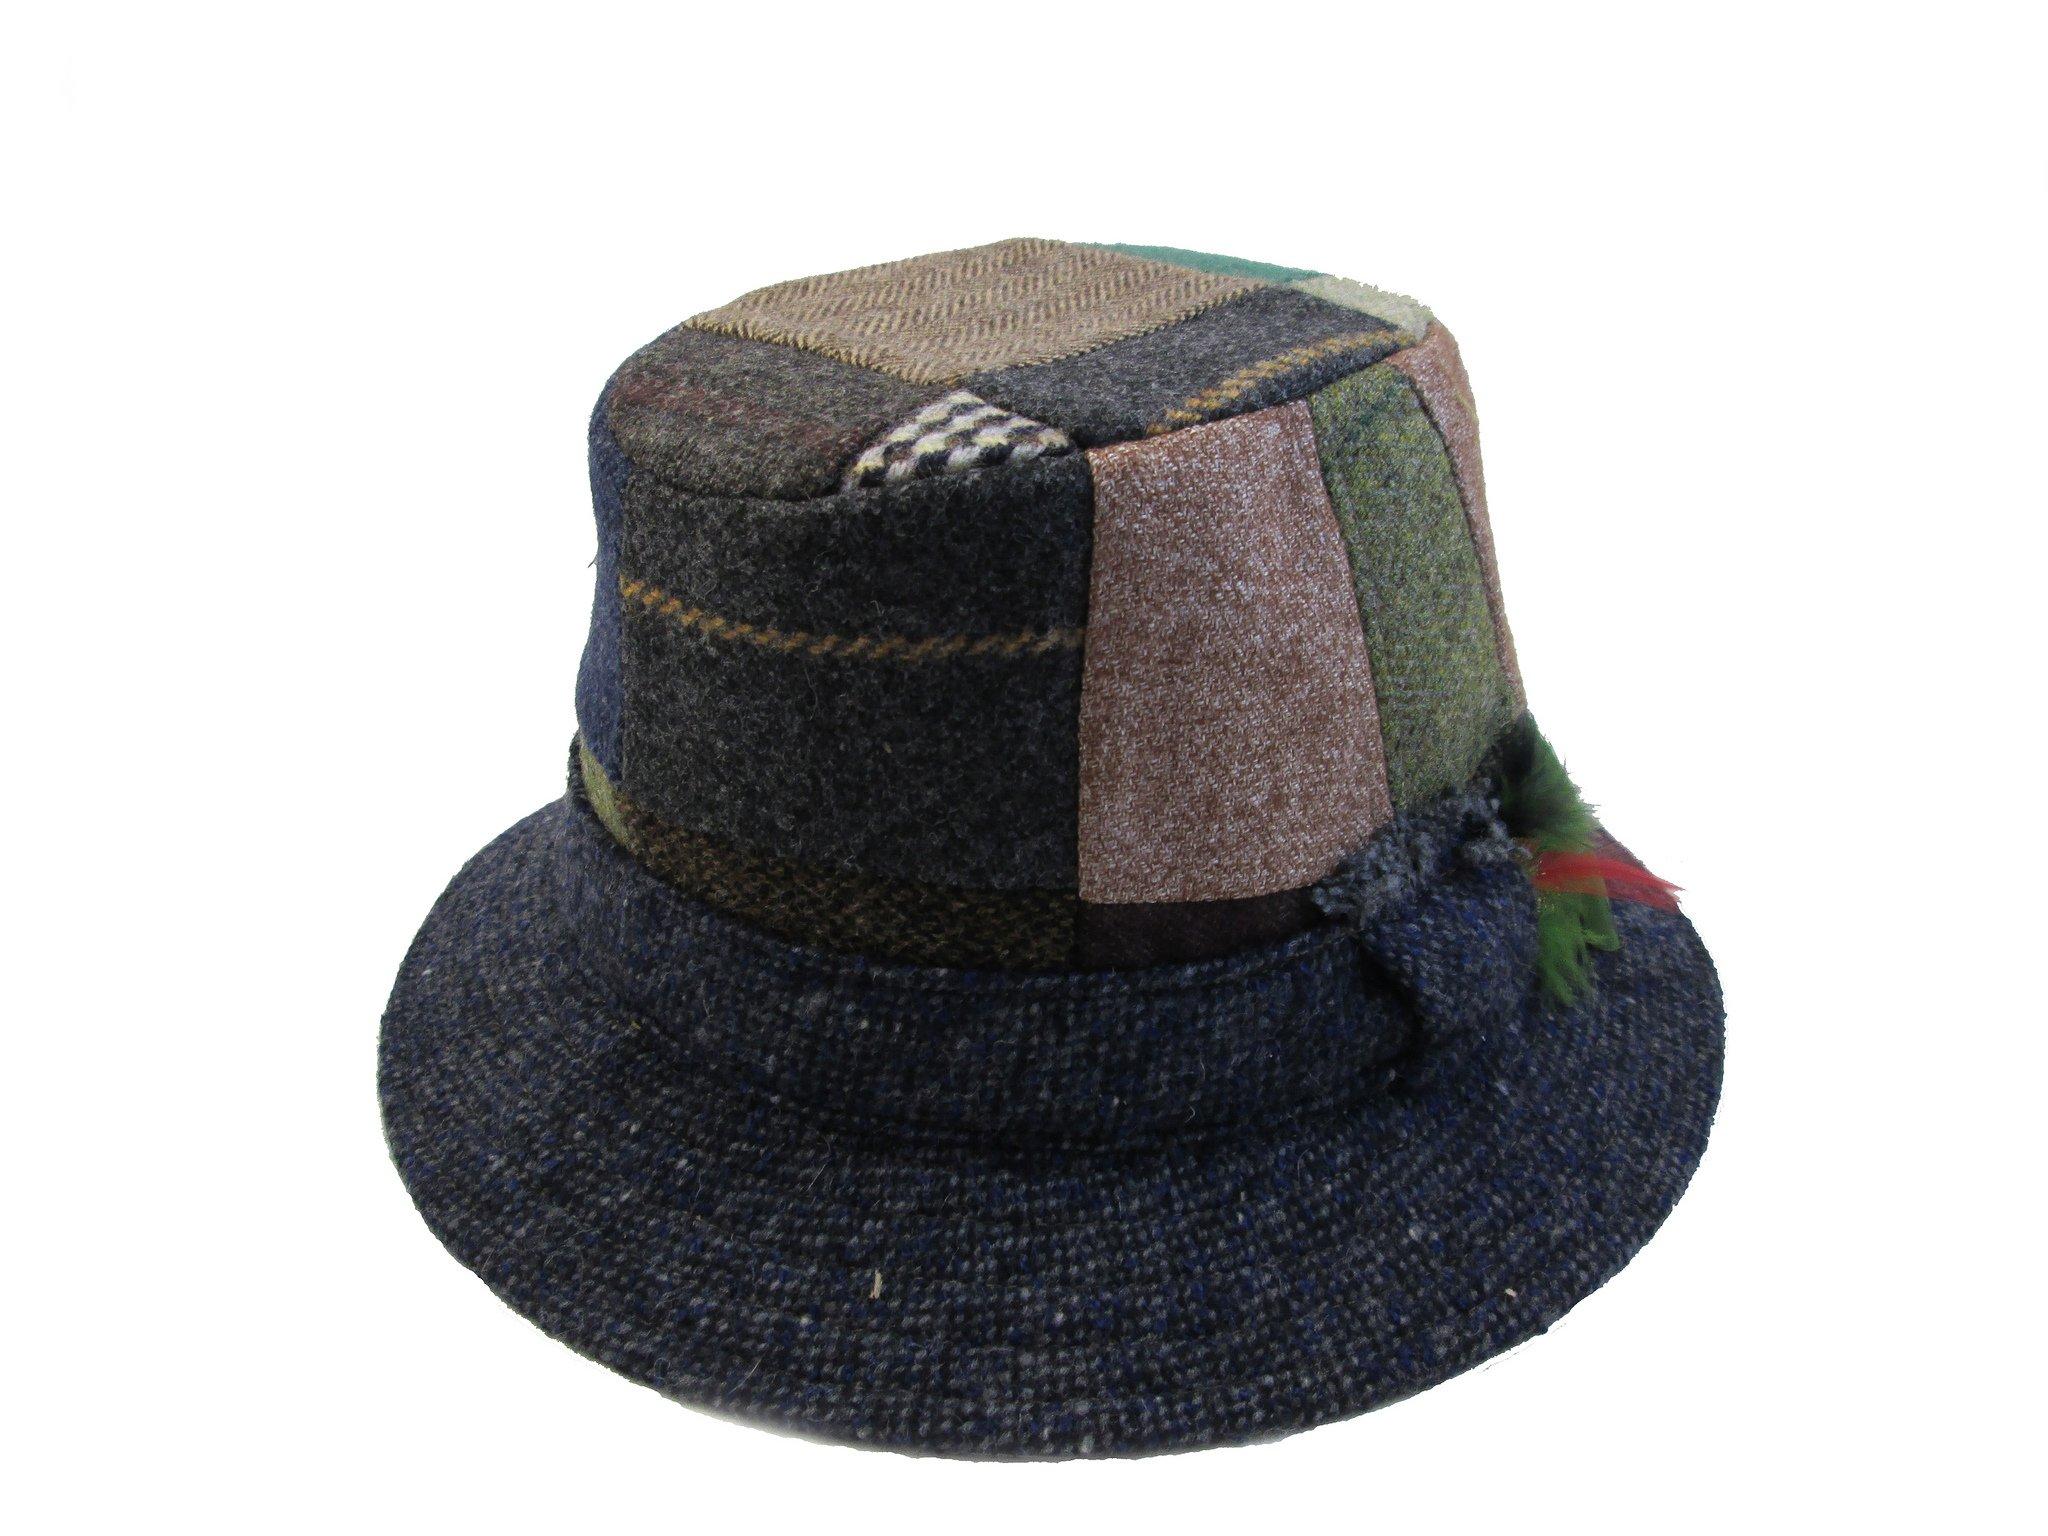 07f9f94047601 Mens Walking Hat Irish Tweed Patchwork Hanna Hats Ireland Medium Apparel